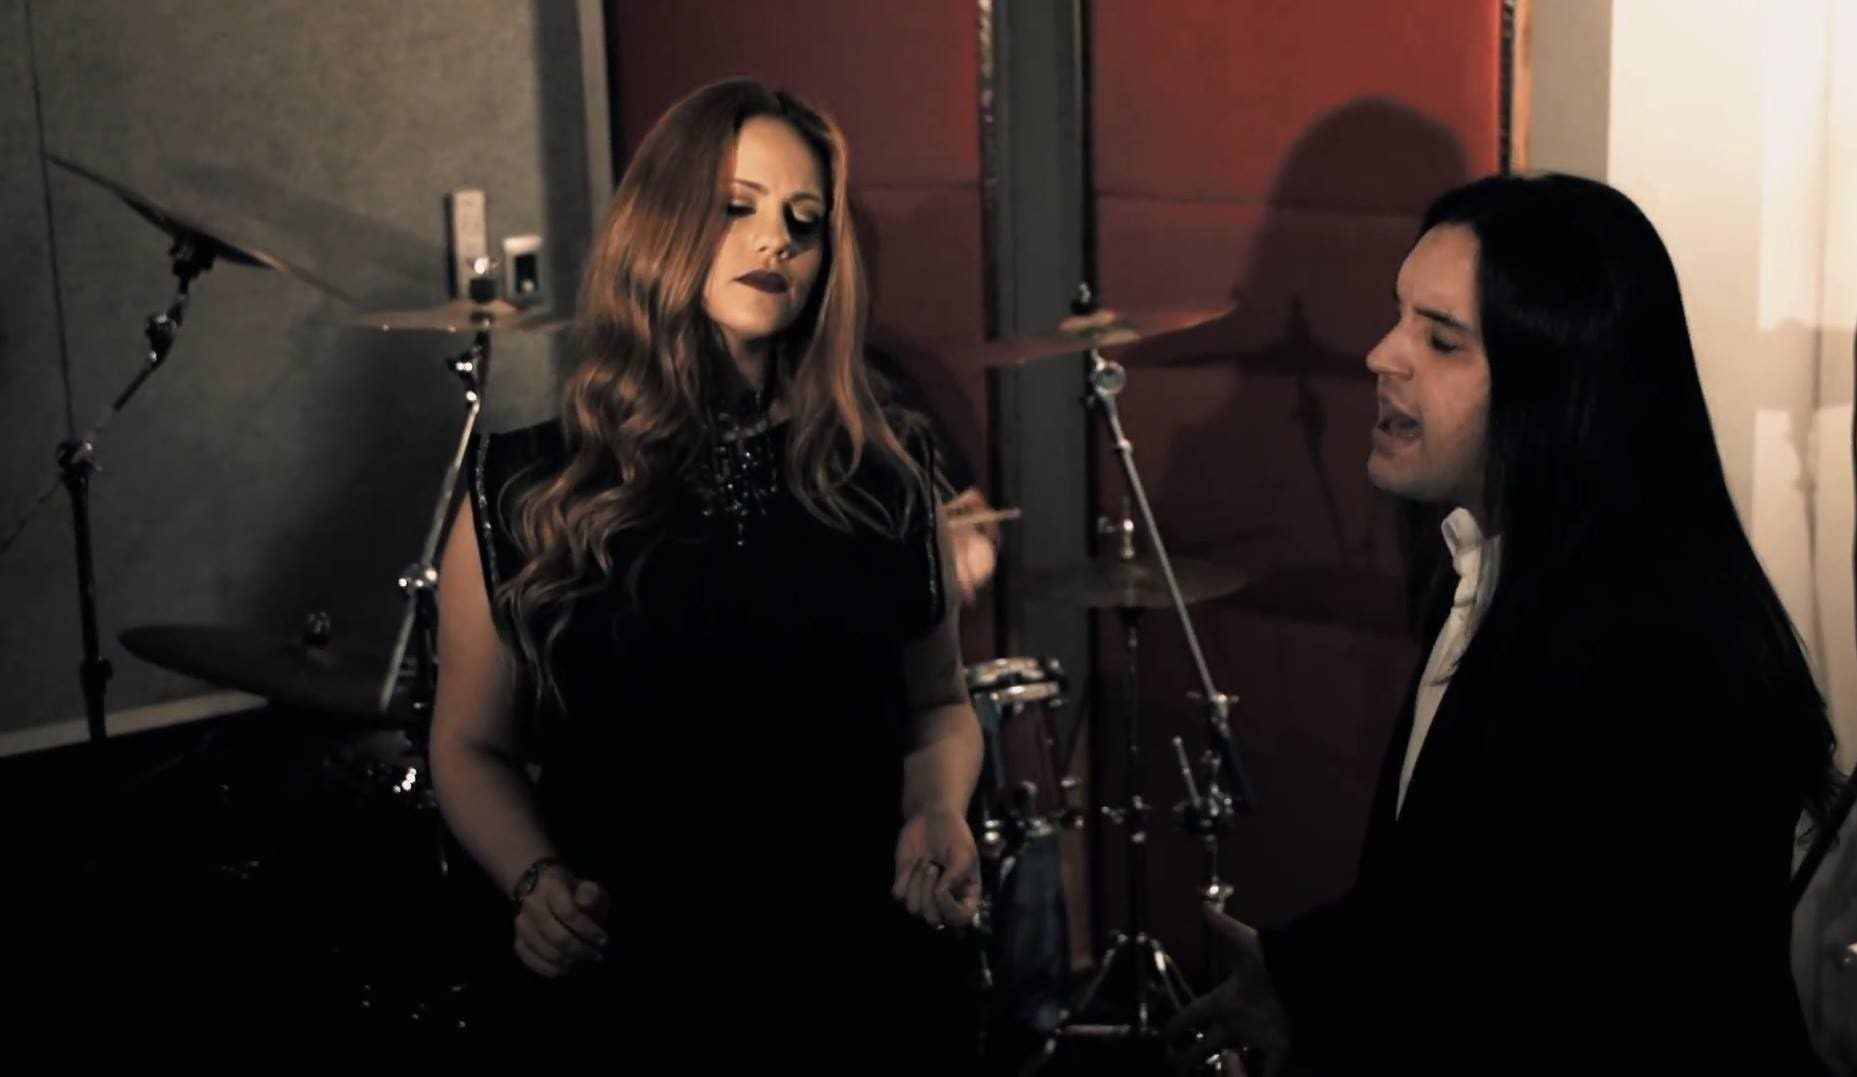 Soulspell Metal Opera My Heart Will Go On Celine Dion S Tribute